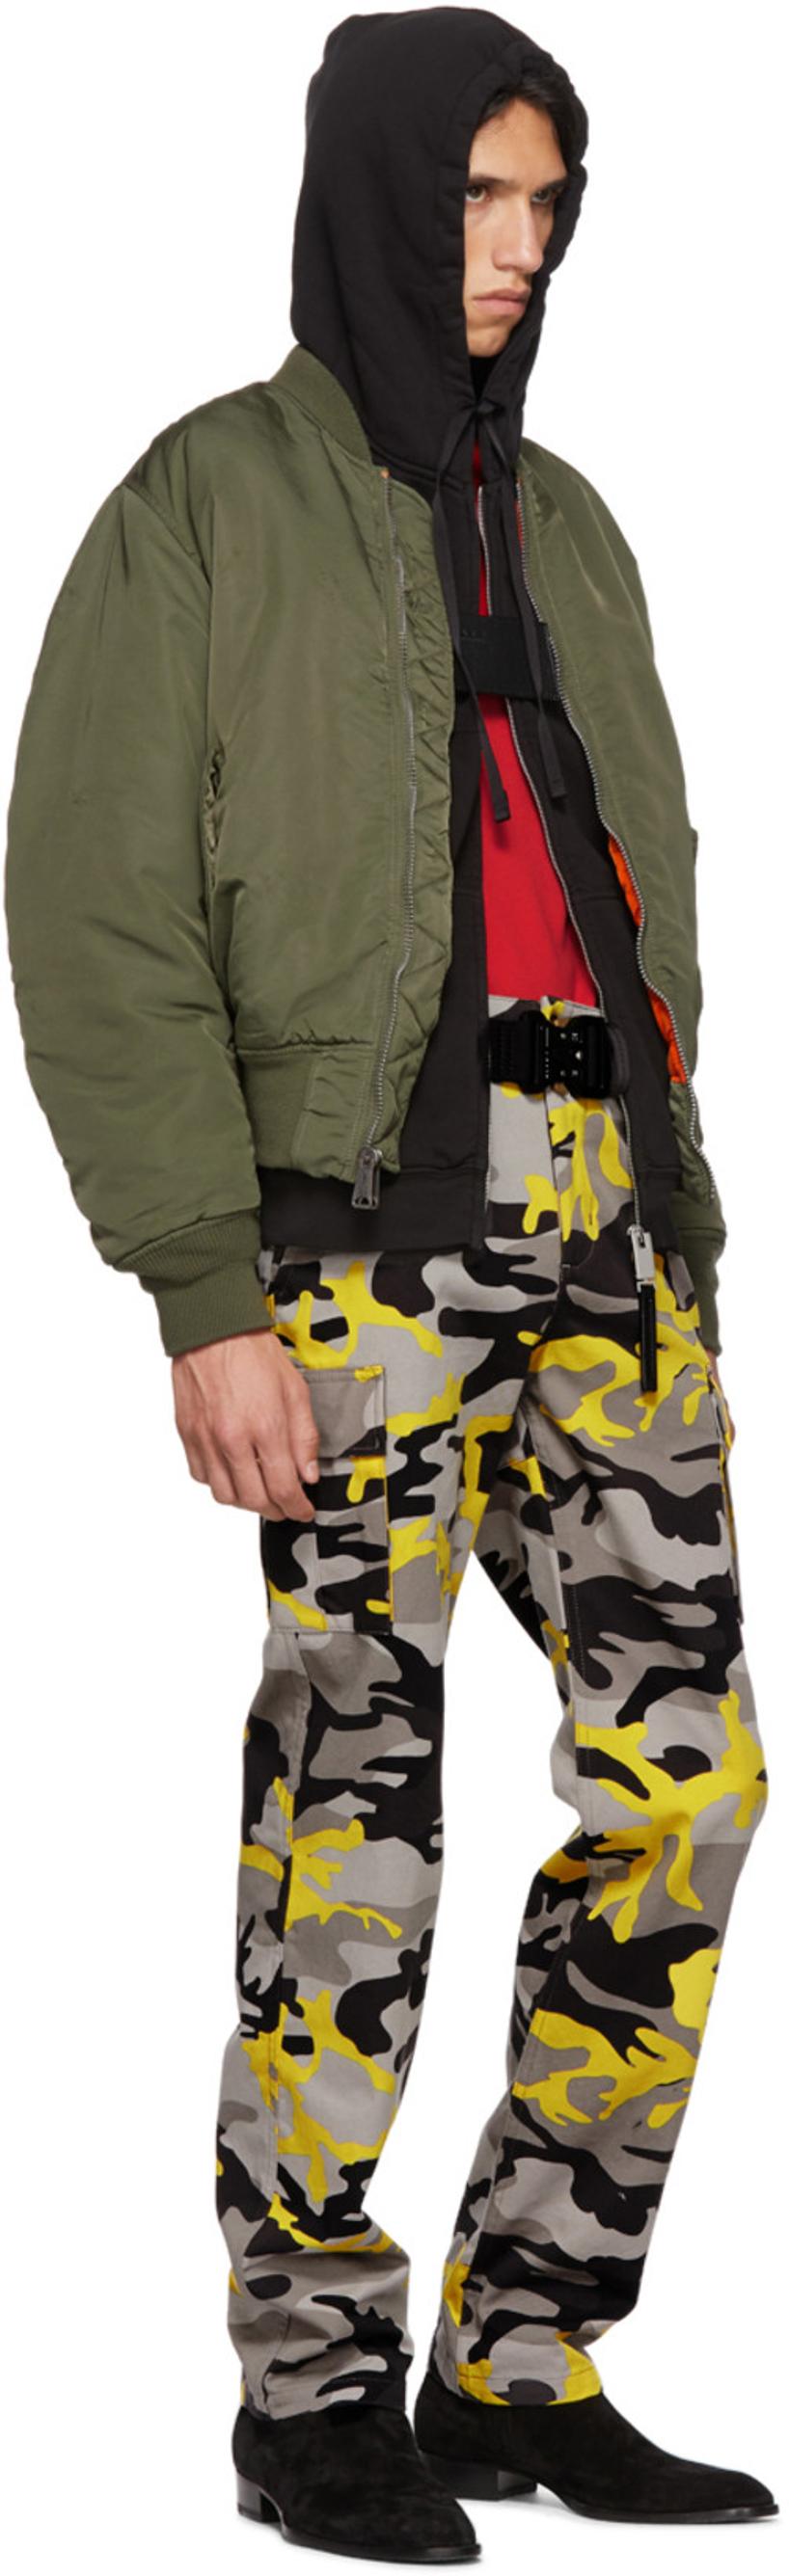 633efa668efd BALENCIAGA Slim-Fit Camouflage-Print Cotton-Twill Cargo Trousers - Yellow  in 8062